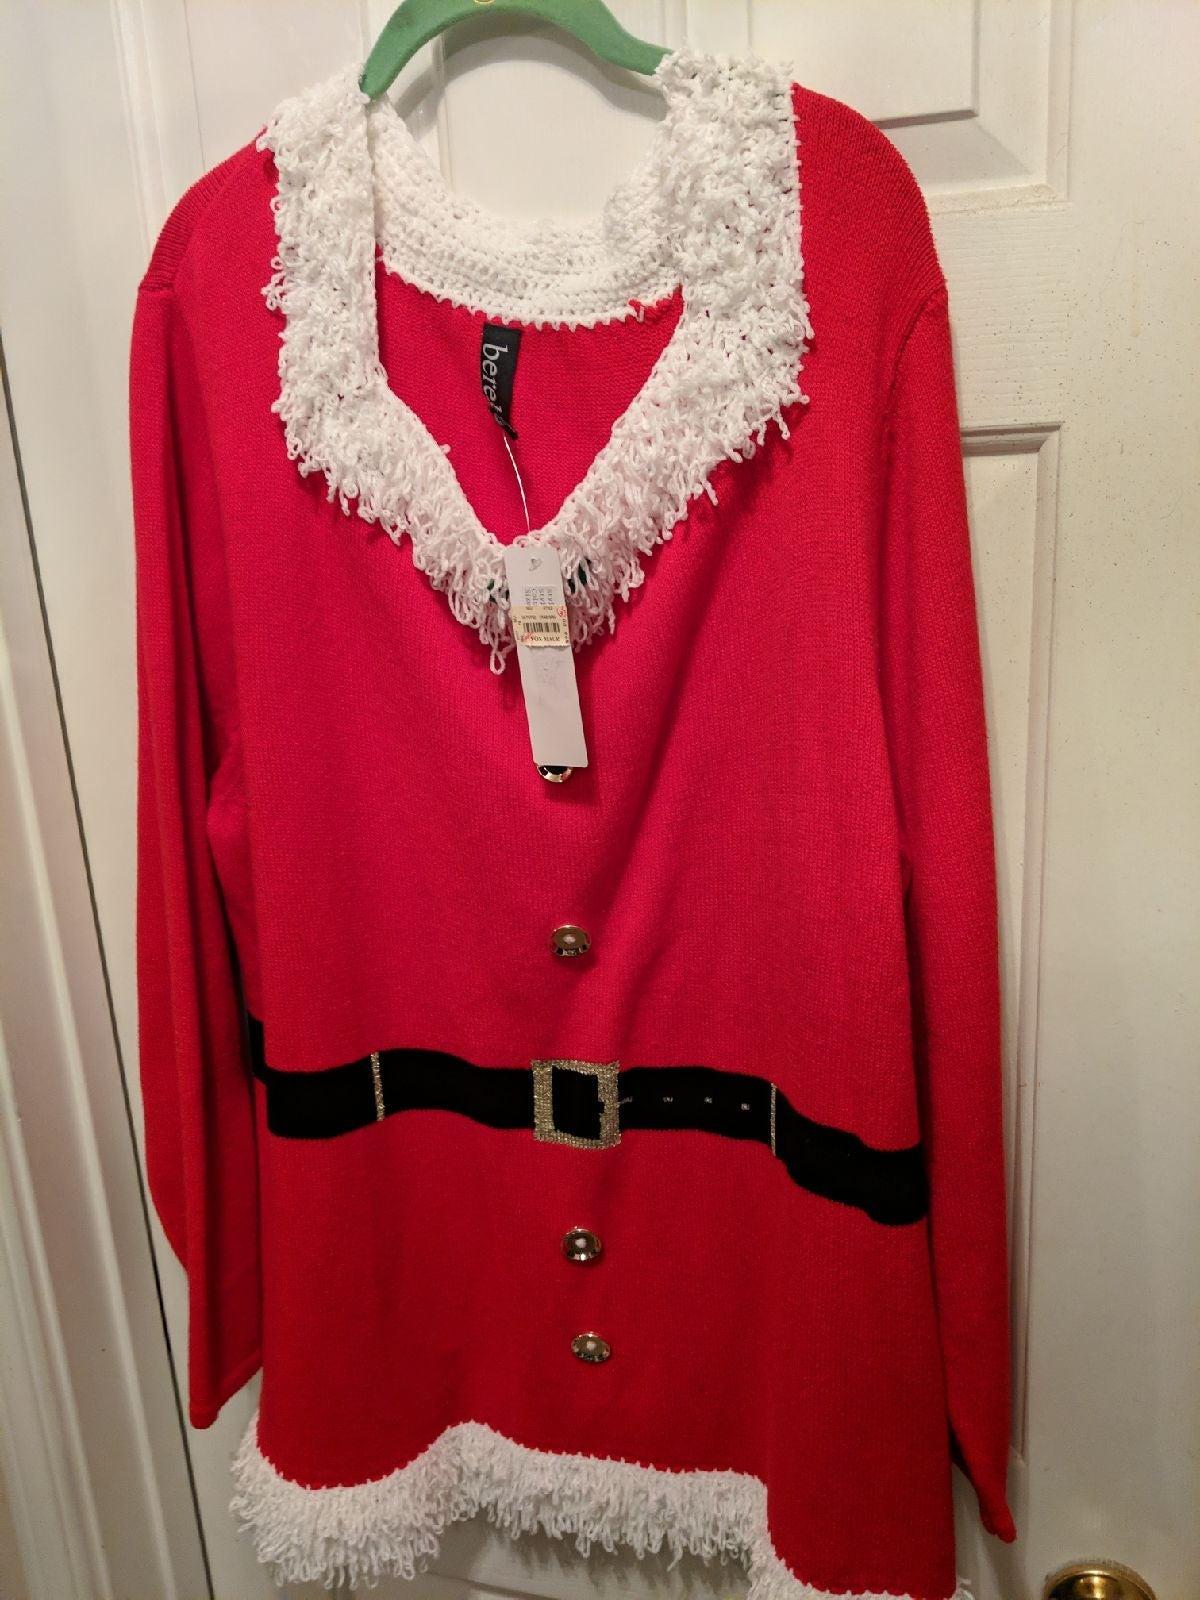 Adorable Christmas sweater